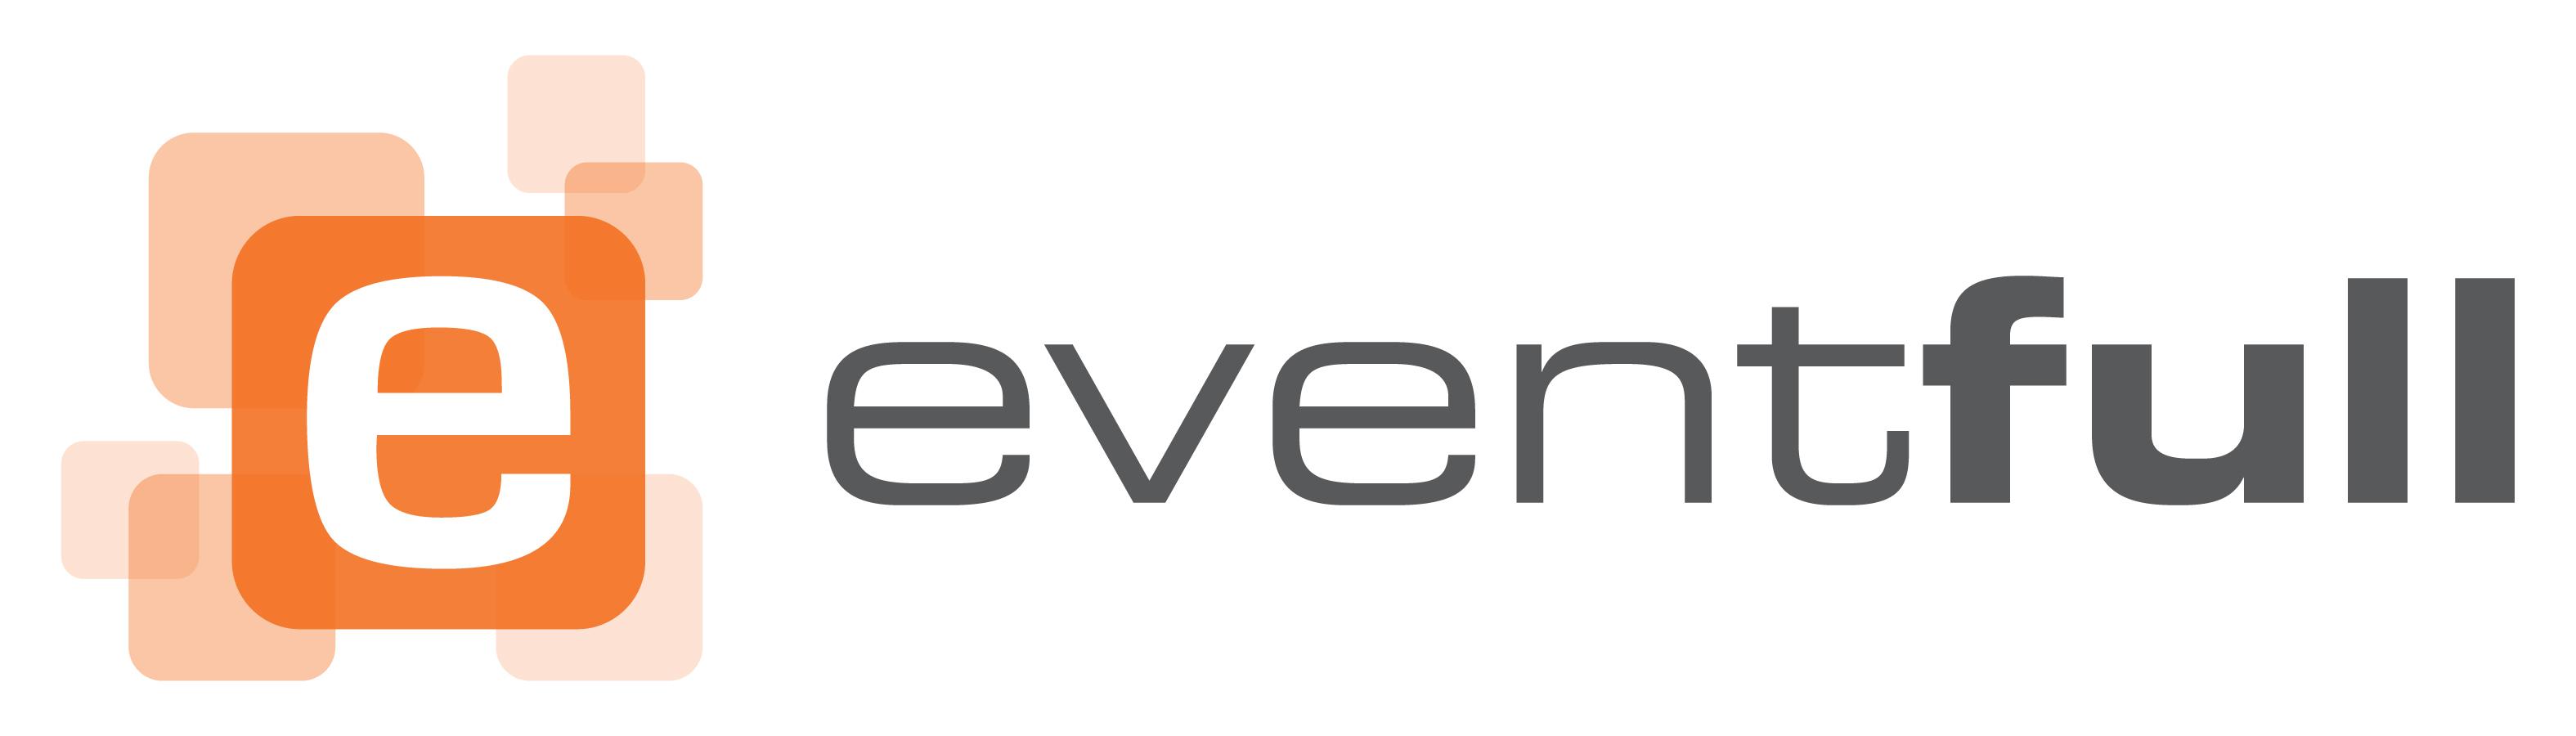 http://eventfullrva.com/